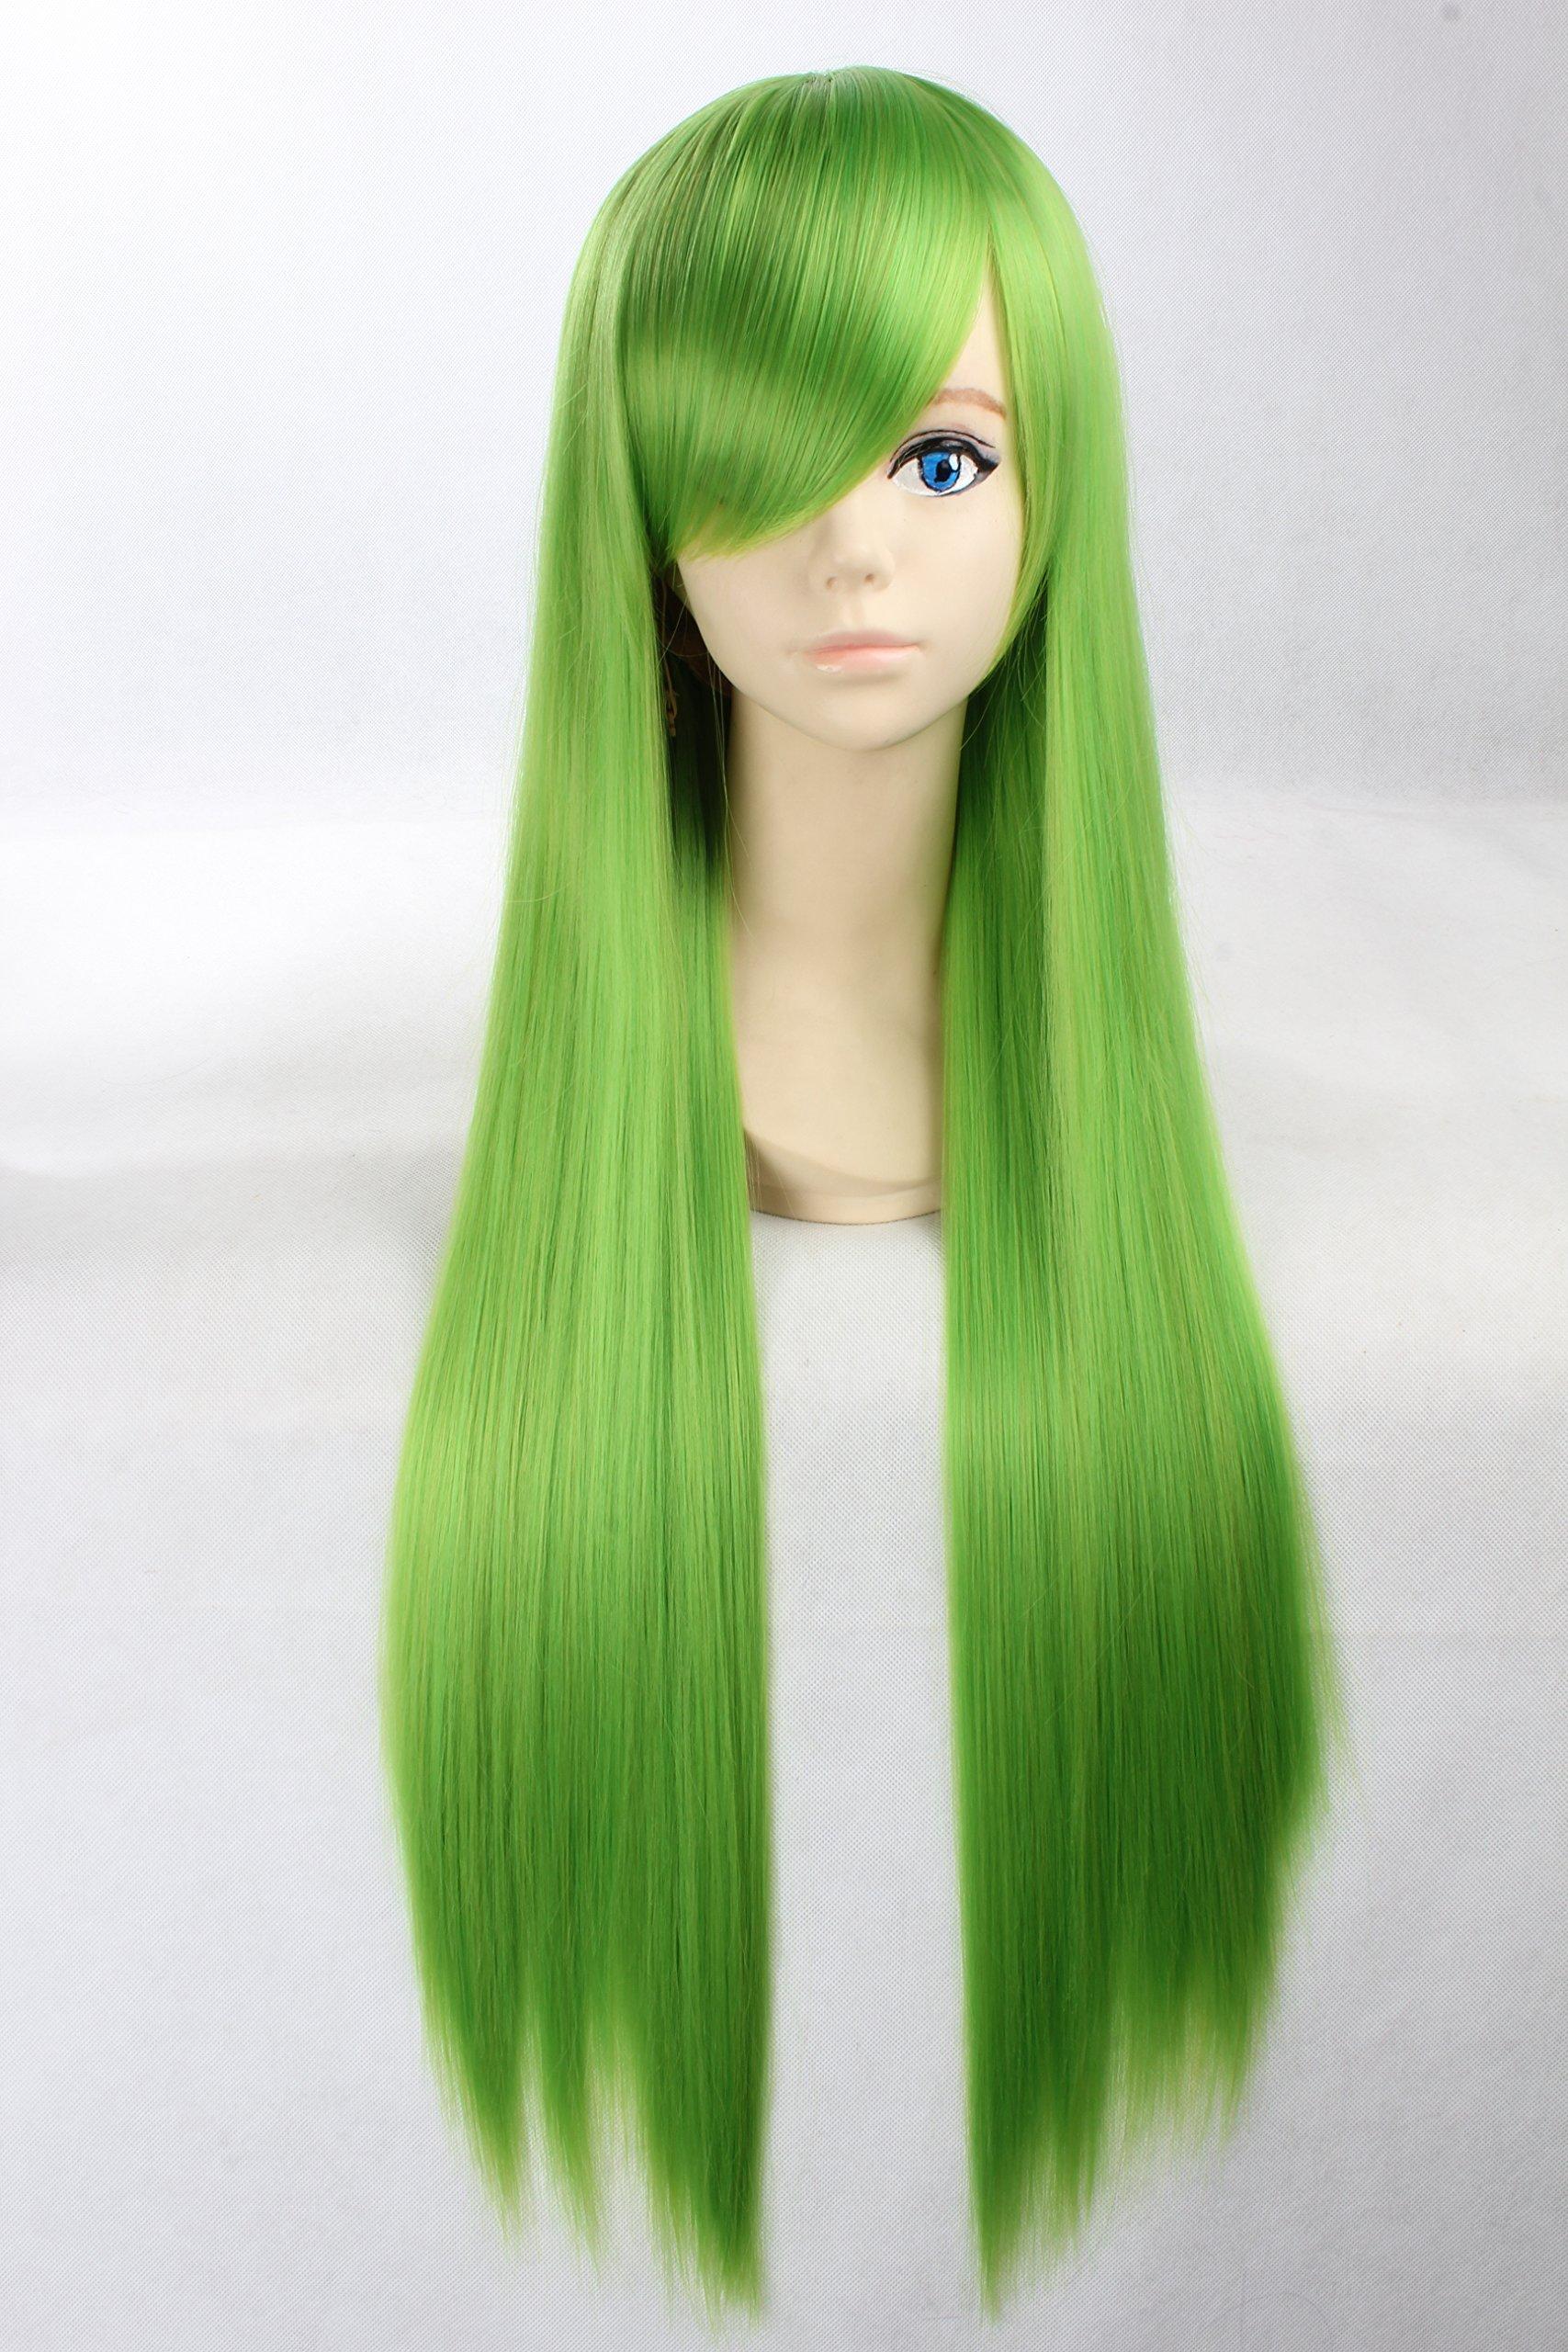 Coolsky Wigs Neon Genesis Evangelion Long Straight Green Hair Cosplay wig Costume